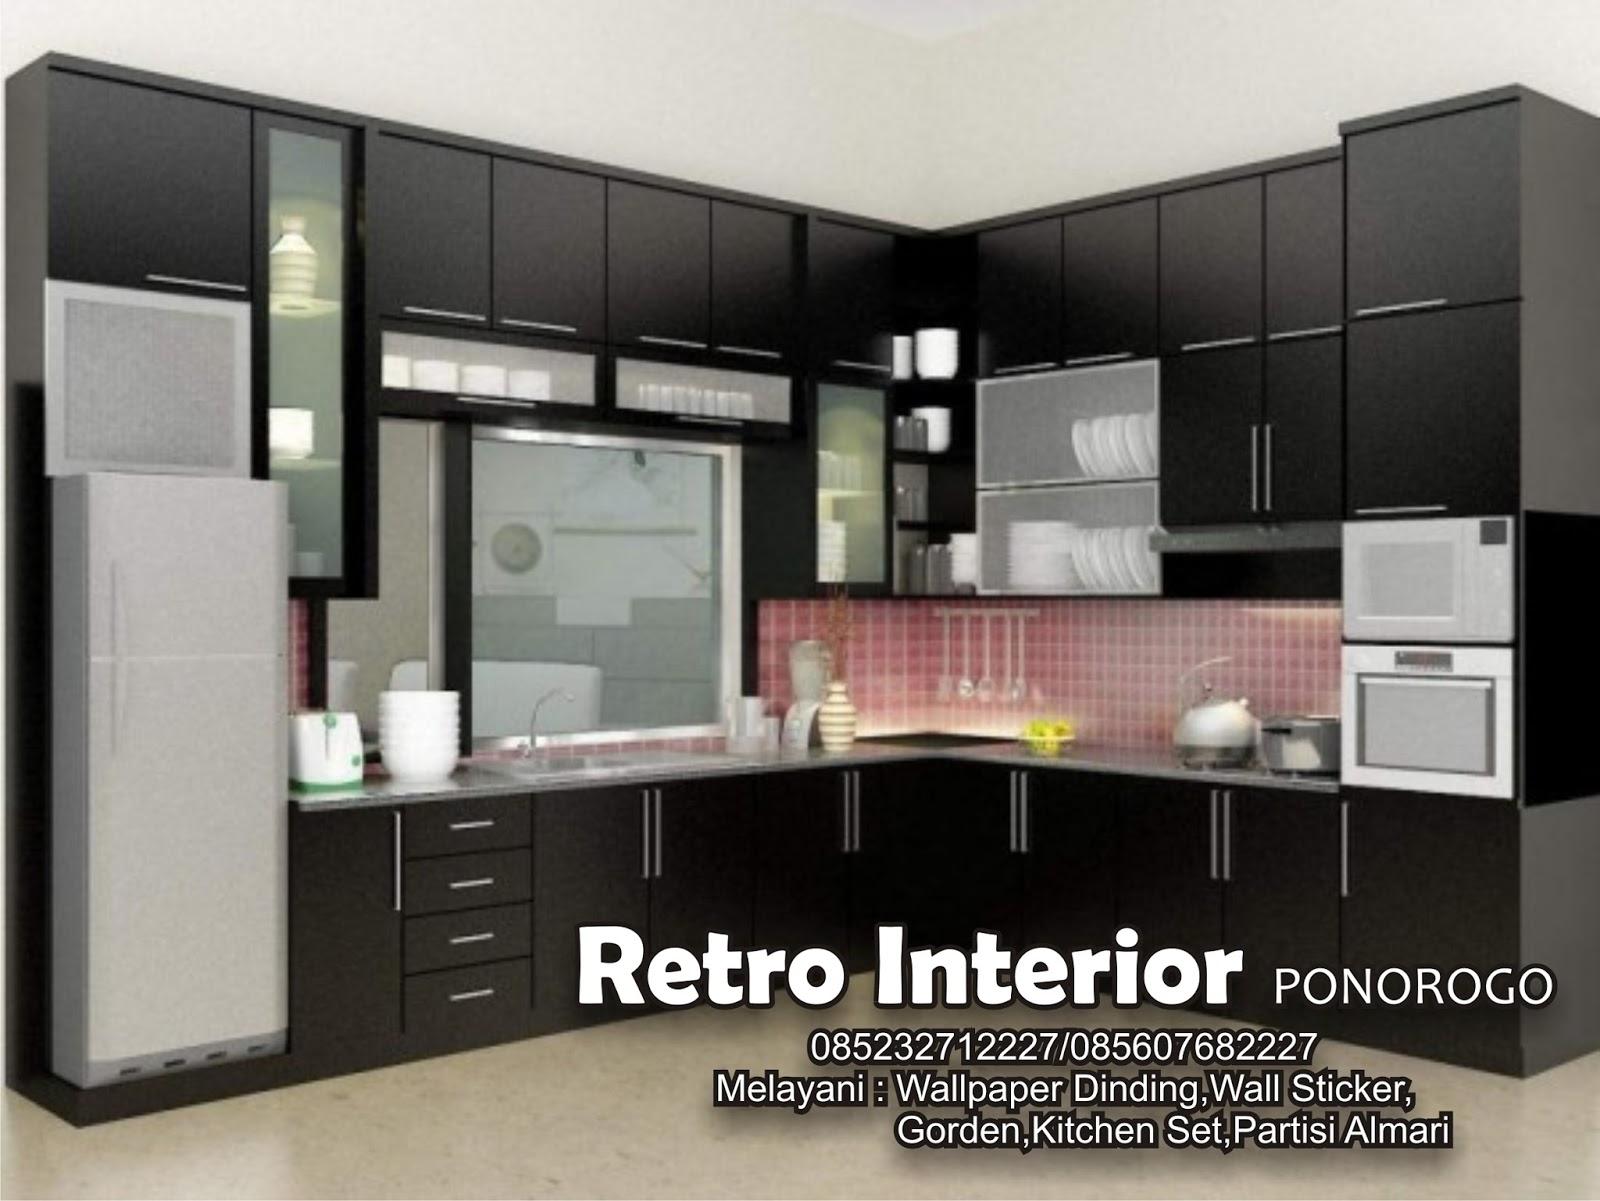 Kitchen set adalah salah satu perangkat dapur berbentuk lemari kabinet yang berfungsi untuk menyimpan alat alat rumah tangga khususnya perlengkapan dapur